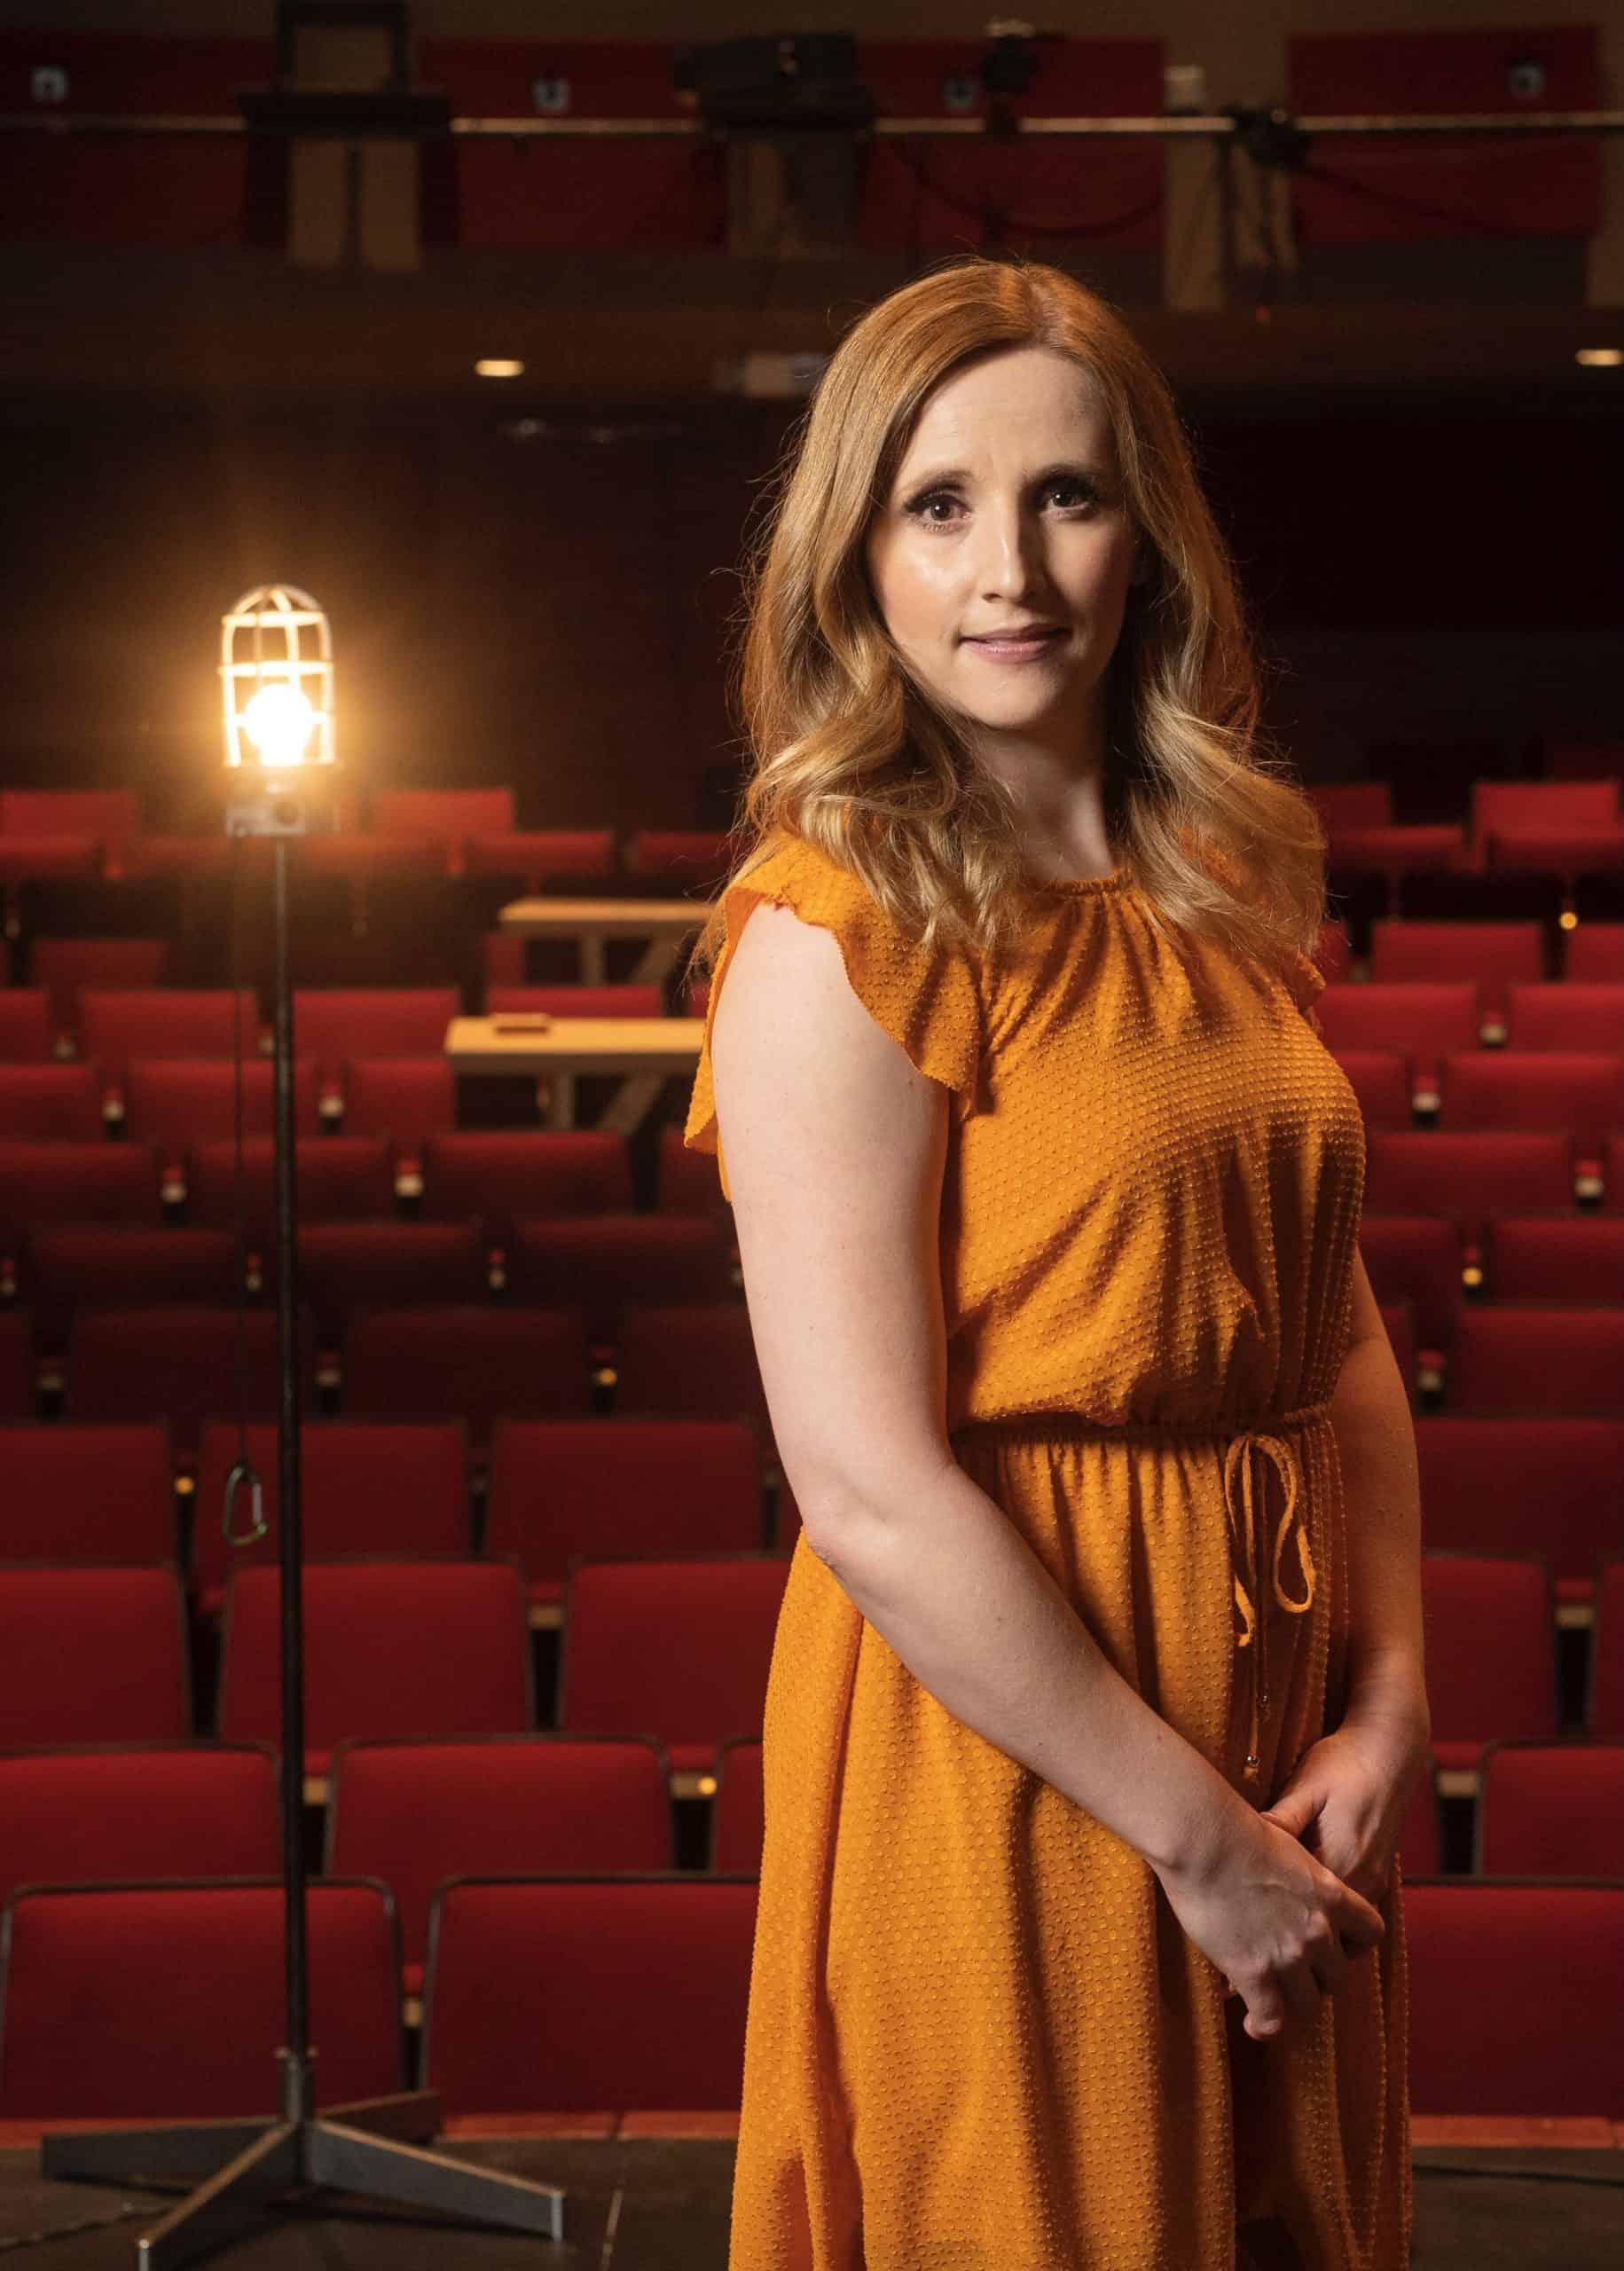 Anita Smith pictured in the empty theatre